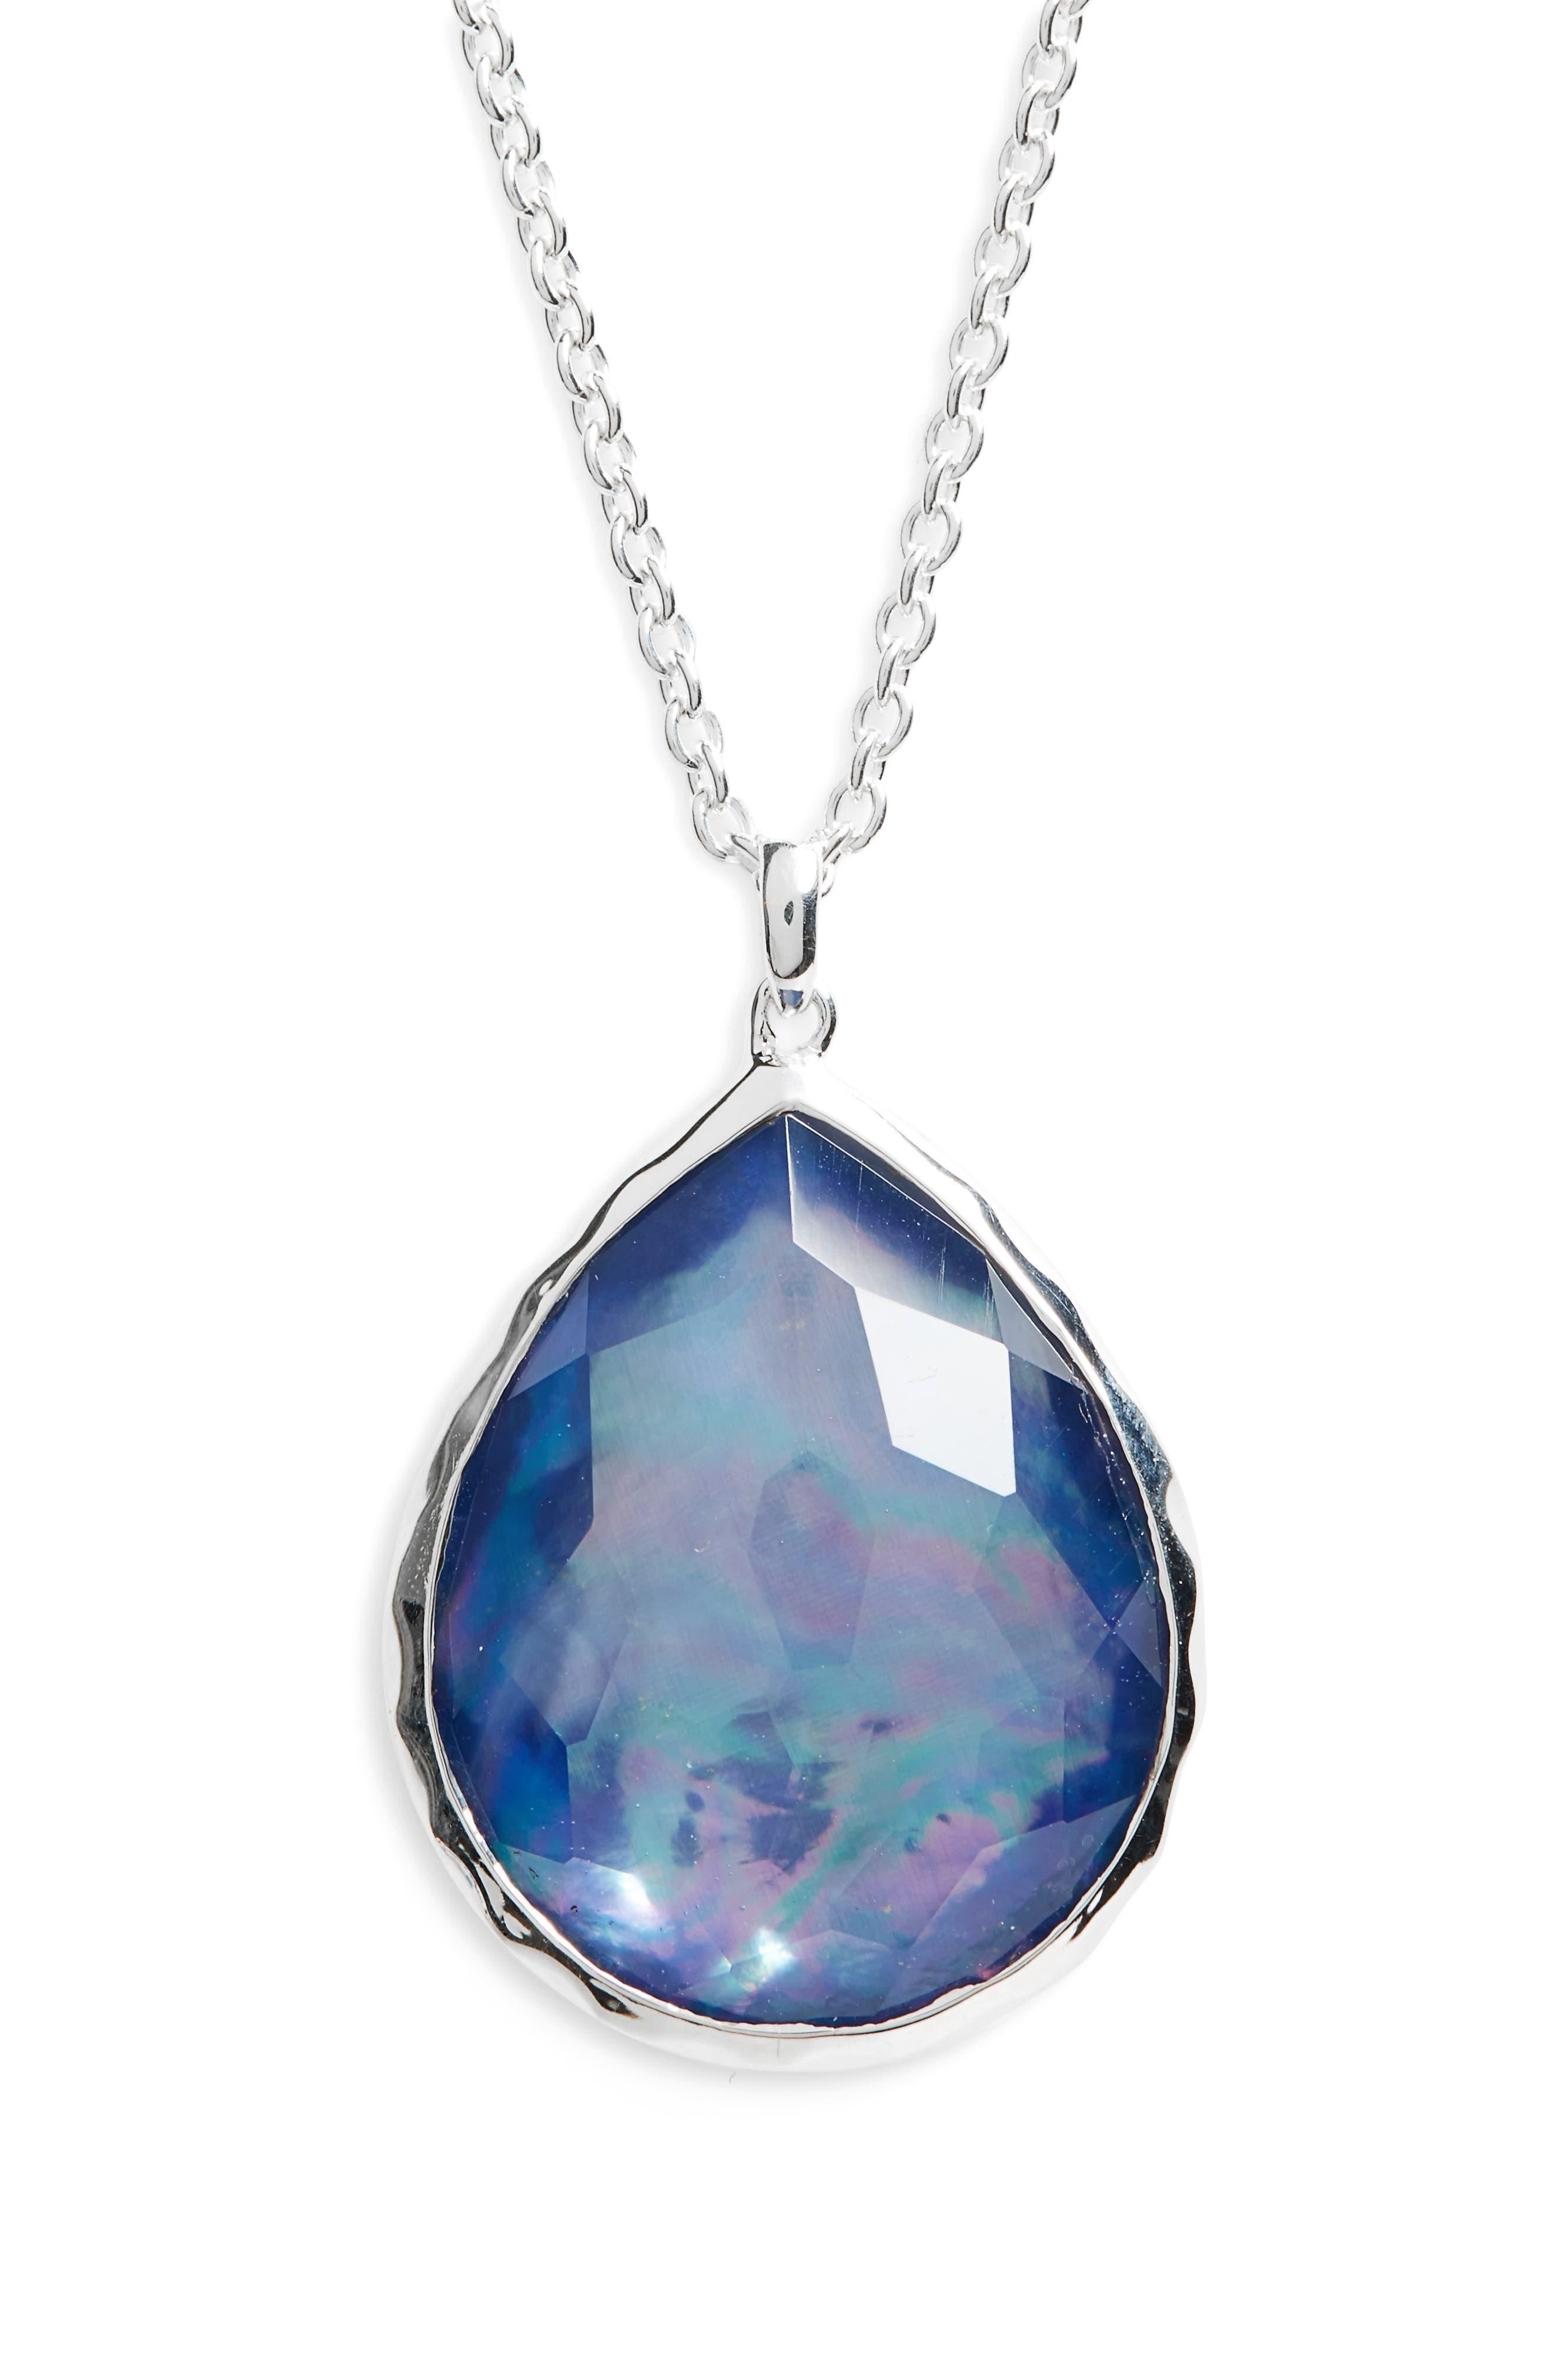 Main Image - Ippolita 'Wonderland' Large Teardrop Pendant Necklace (Nordstrom Exclusive)